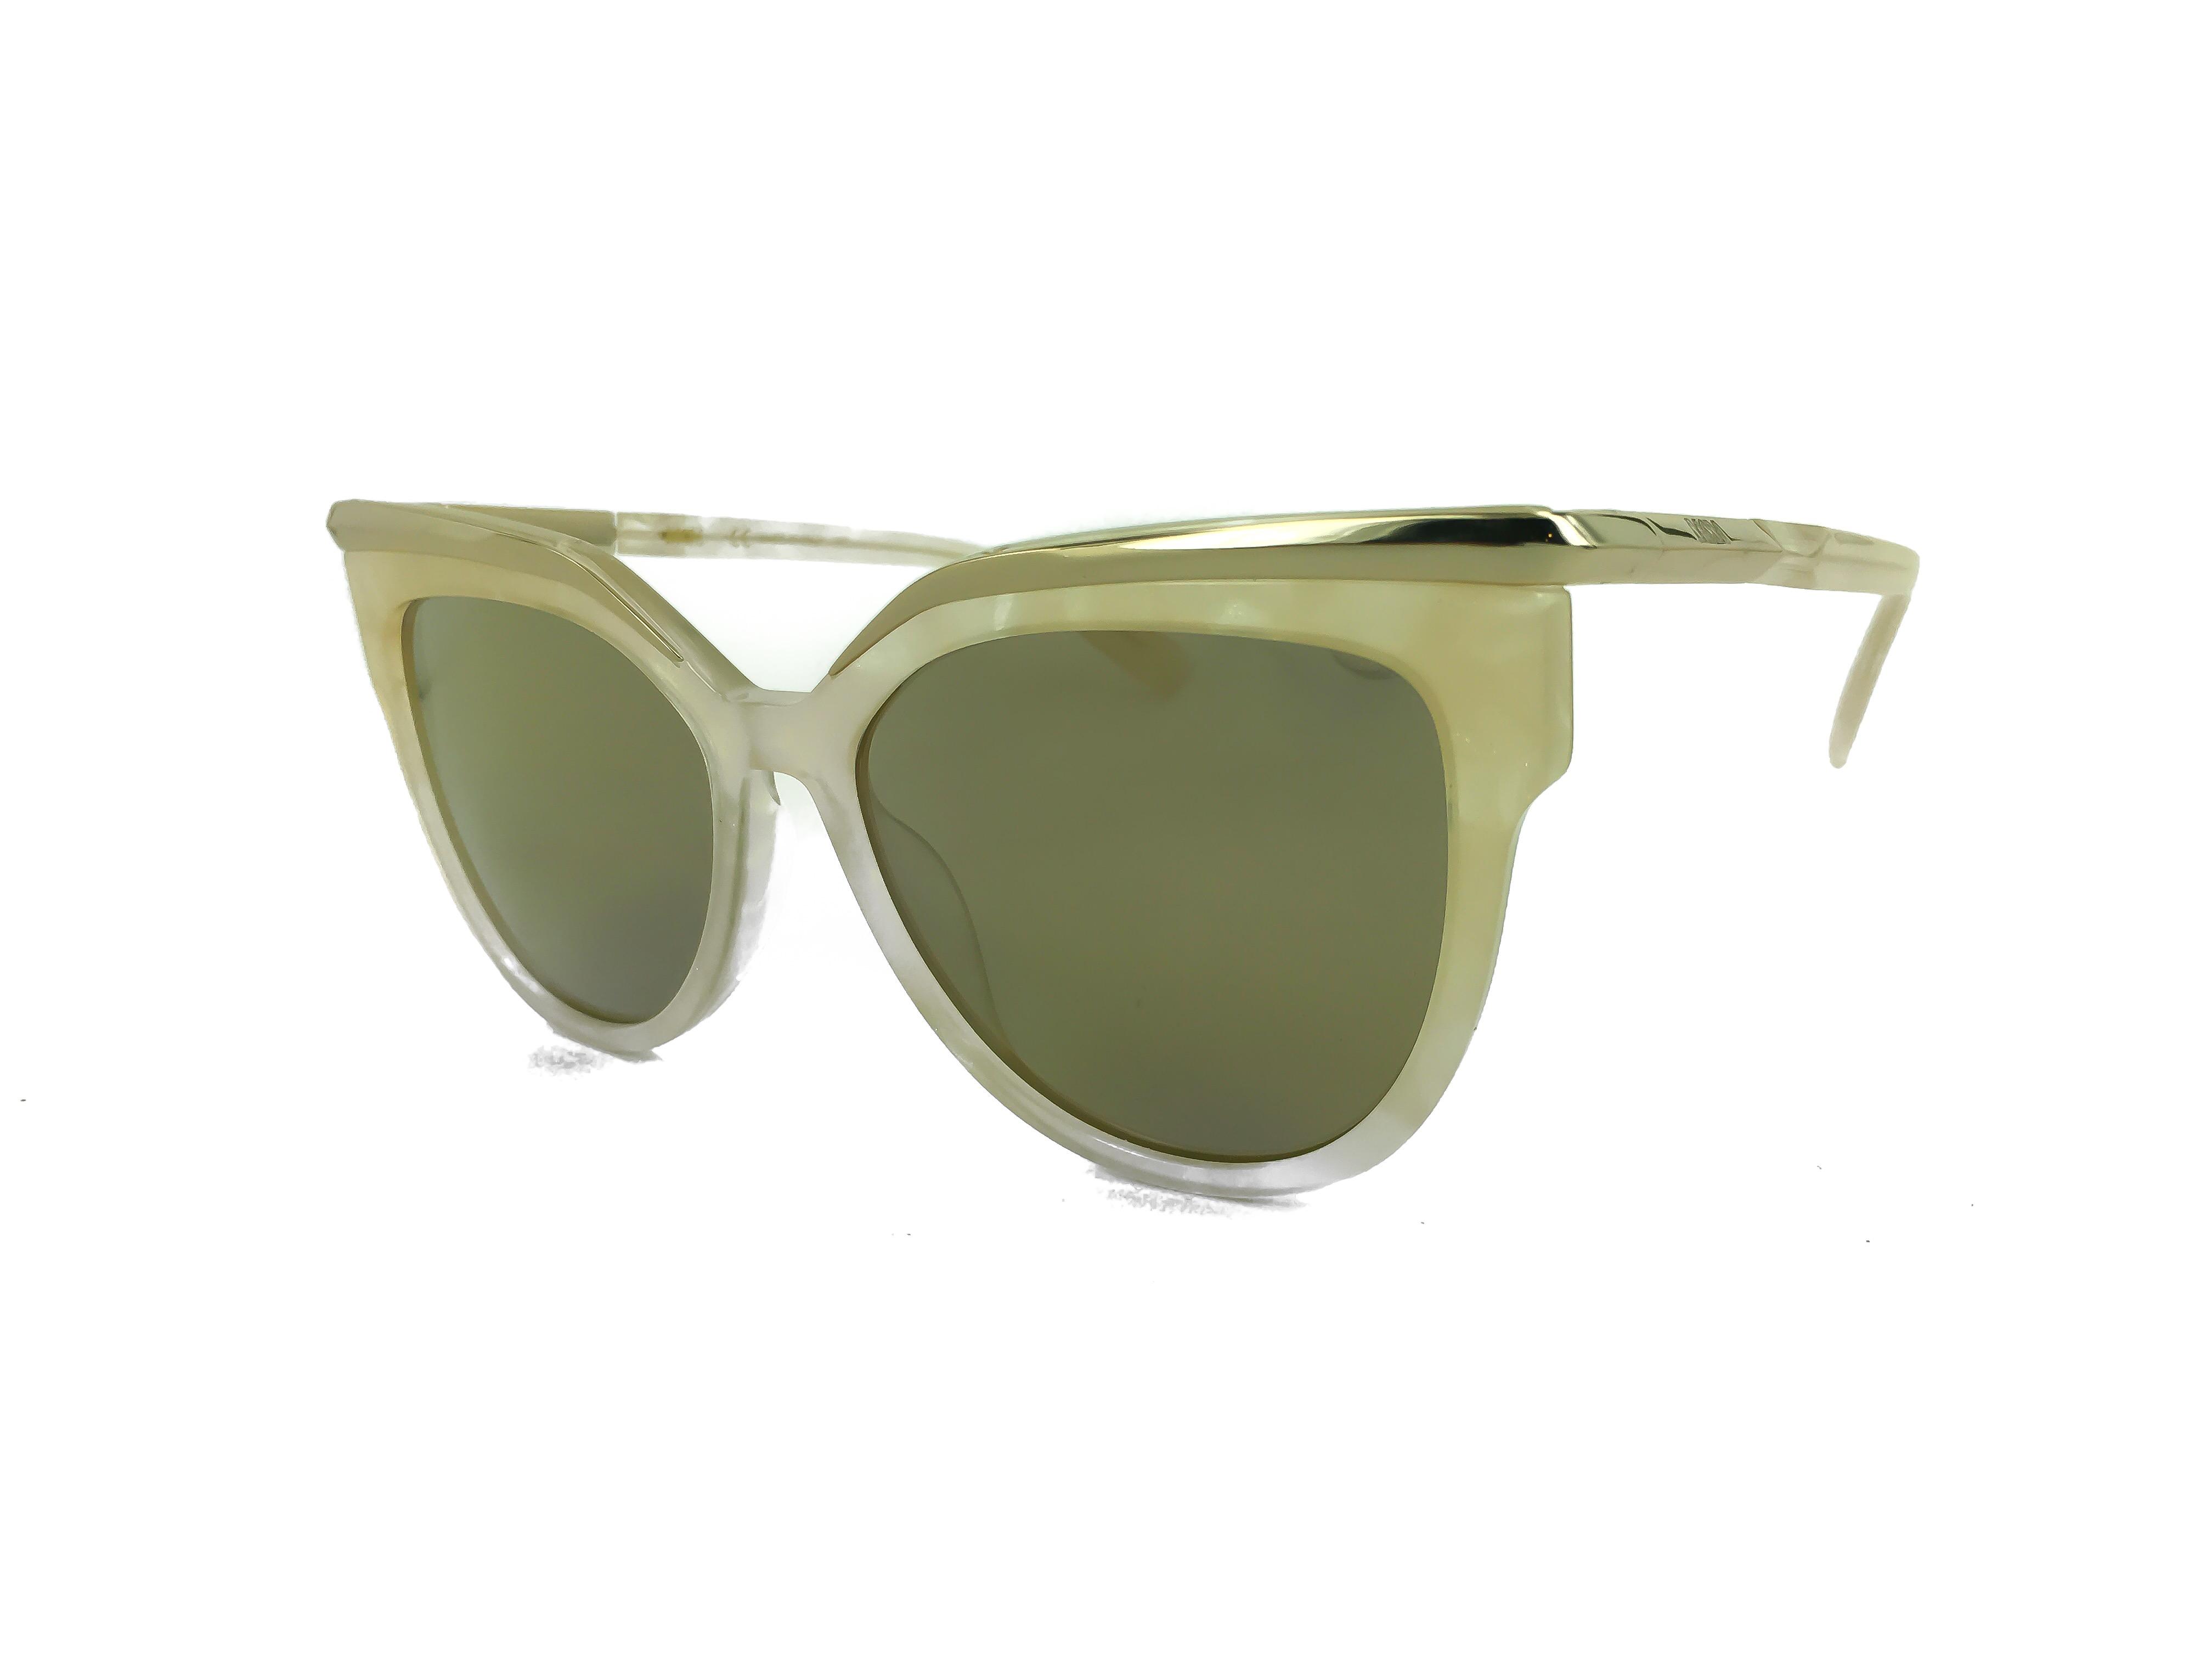 c0e89a864f Τα γυαλιά ηλίου MCM637S 103 5616 ταιριάζουν ιδανικά σε μεσαία και μεγάλα  πρόσωπα χαρίζοντας μοναδικό στυλ. Οι φακοί είναι οργανικοί